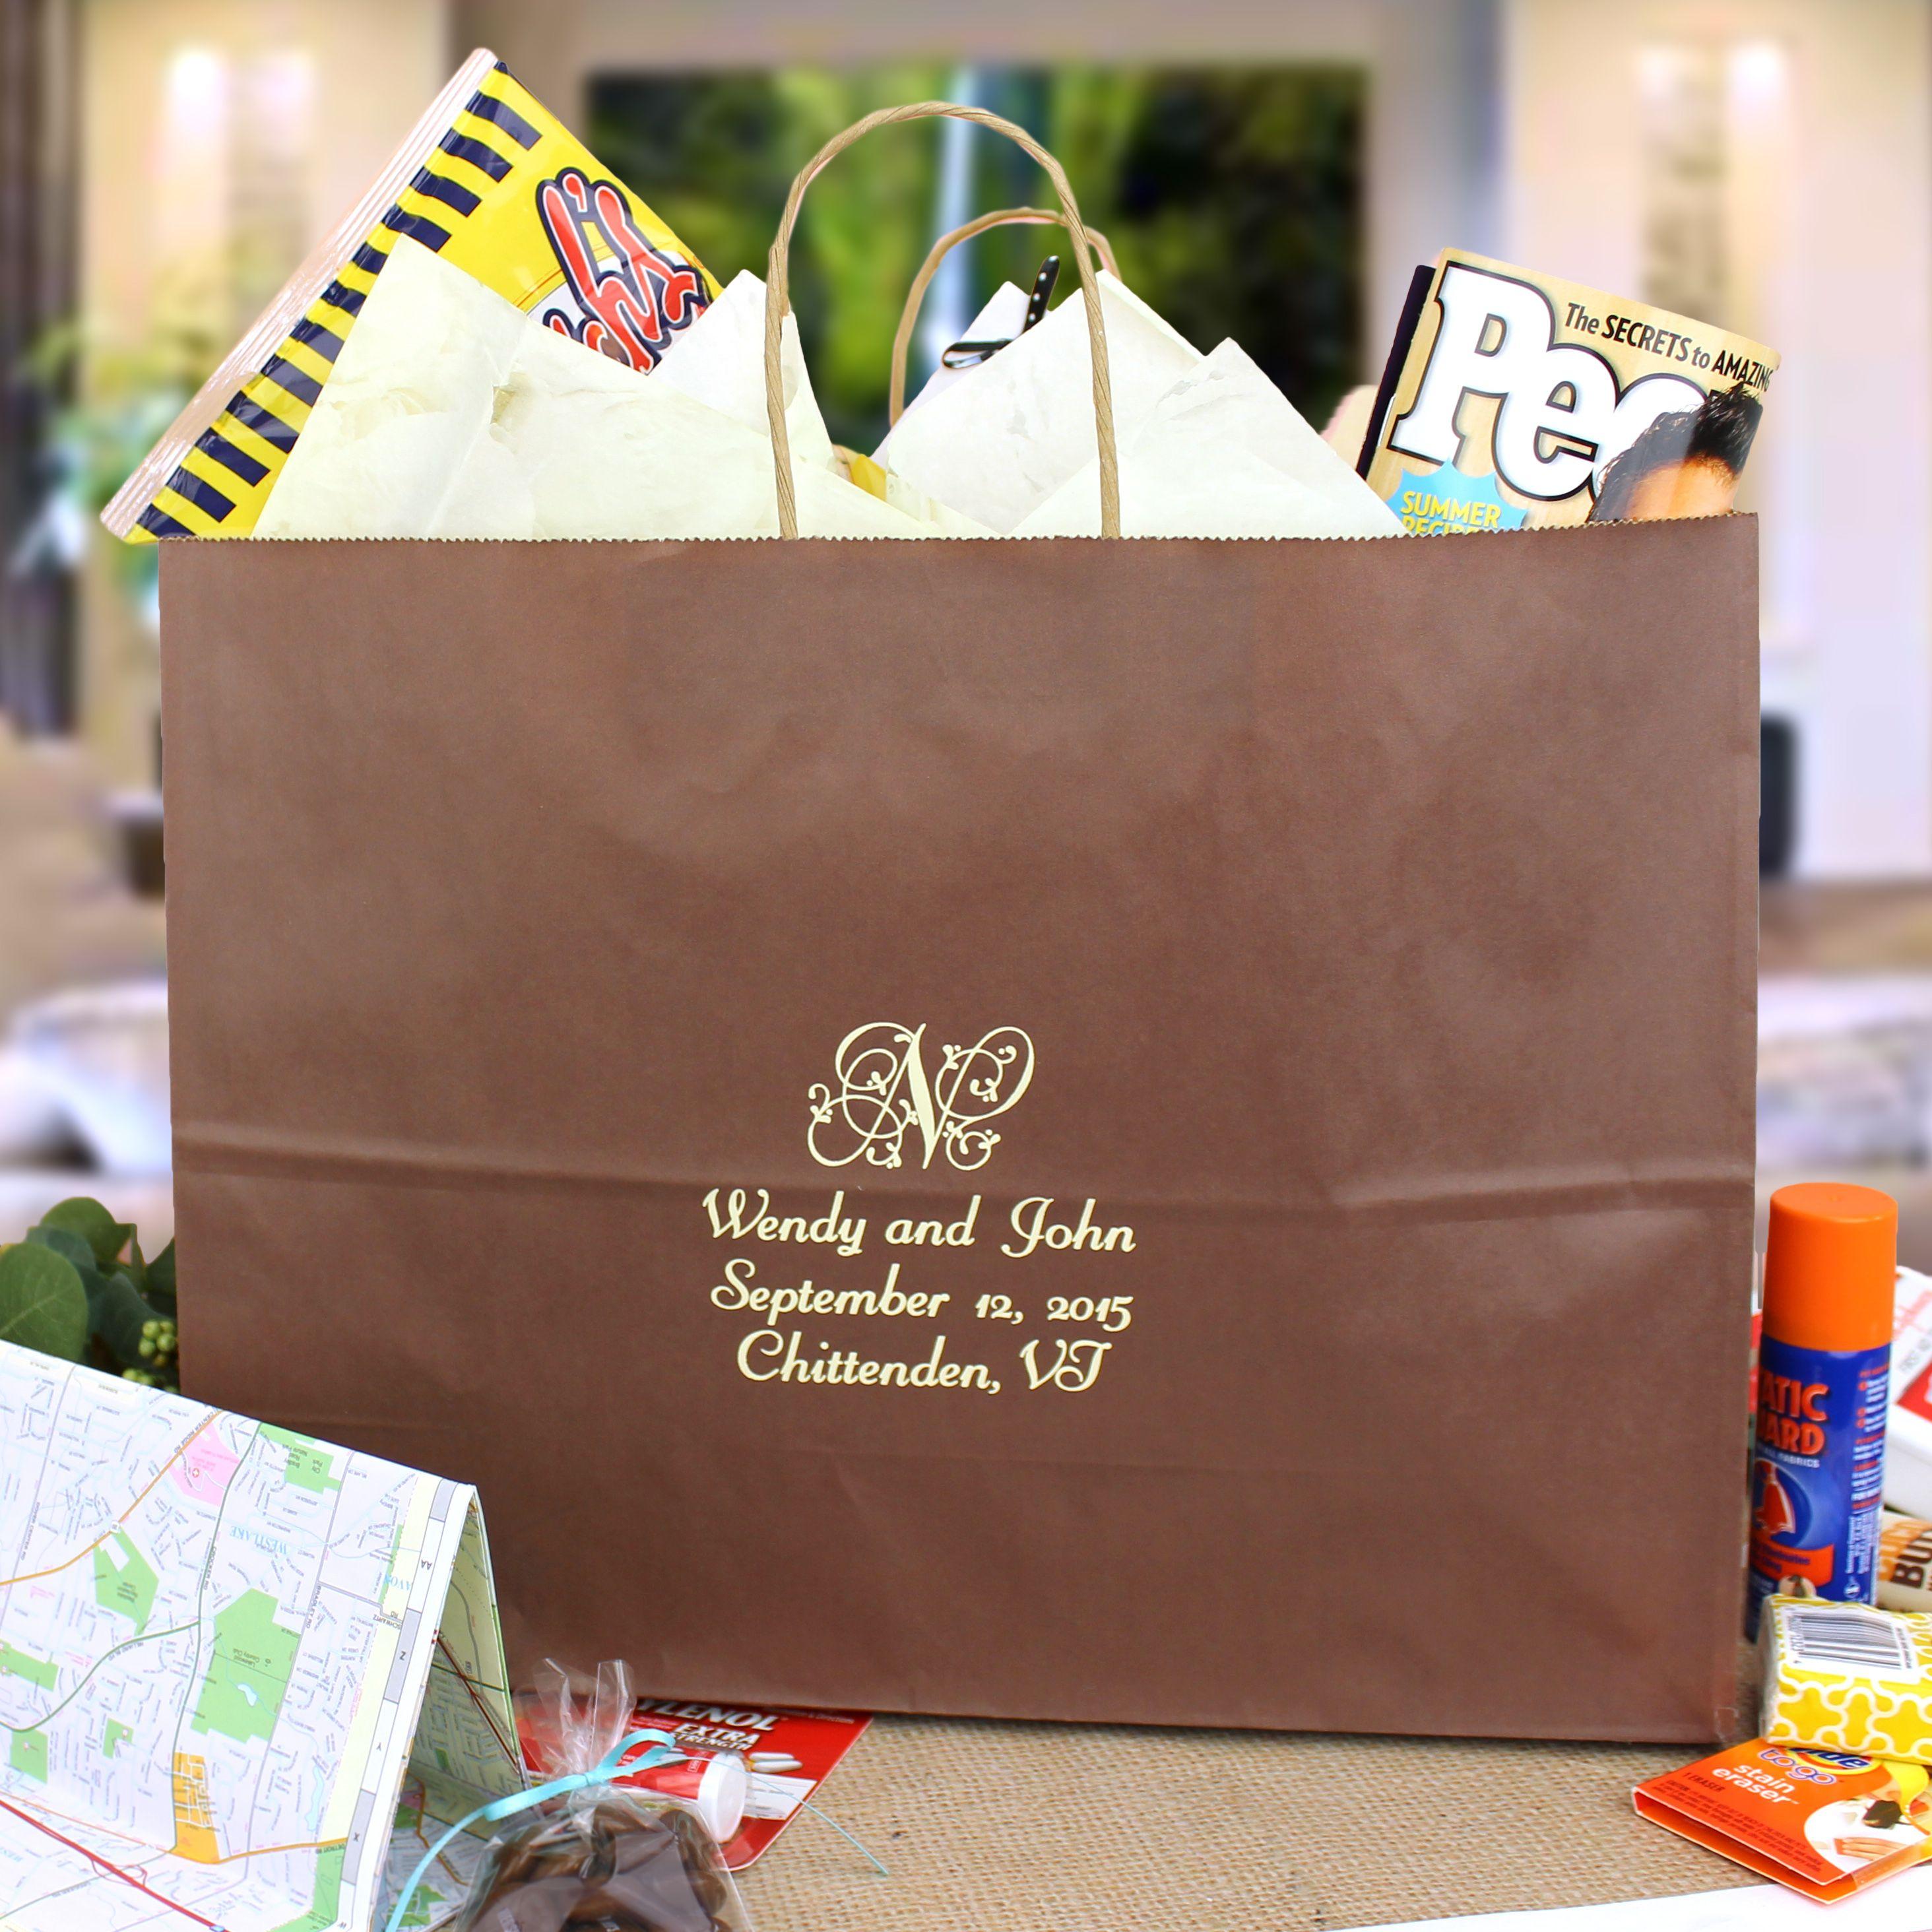 16 X 12 Custom Printed Kraft Paper Wedding Gift Bags